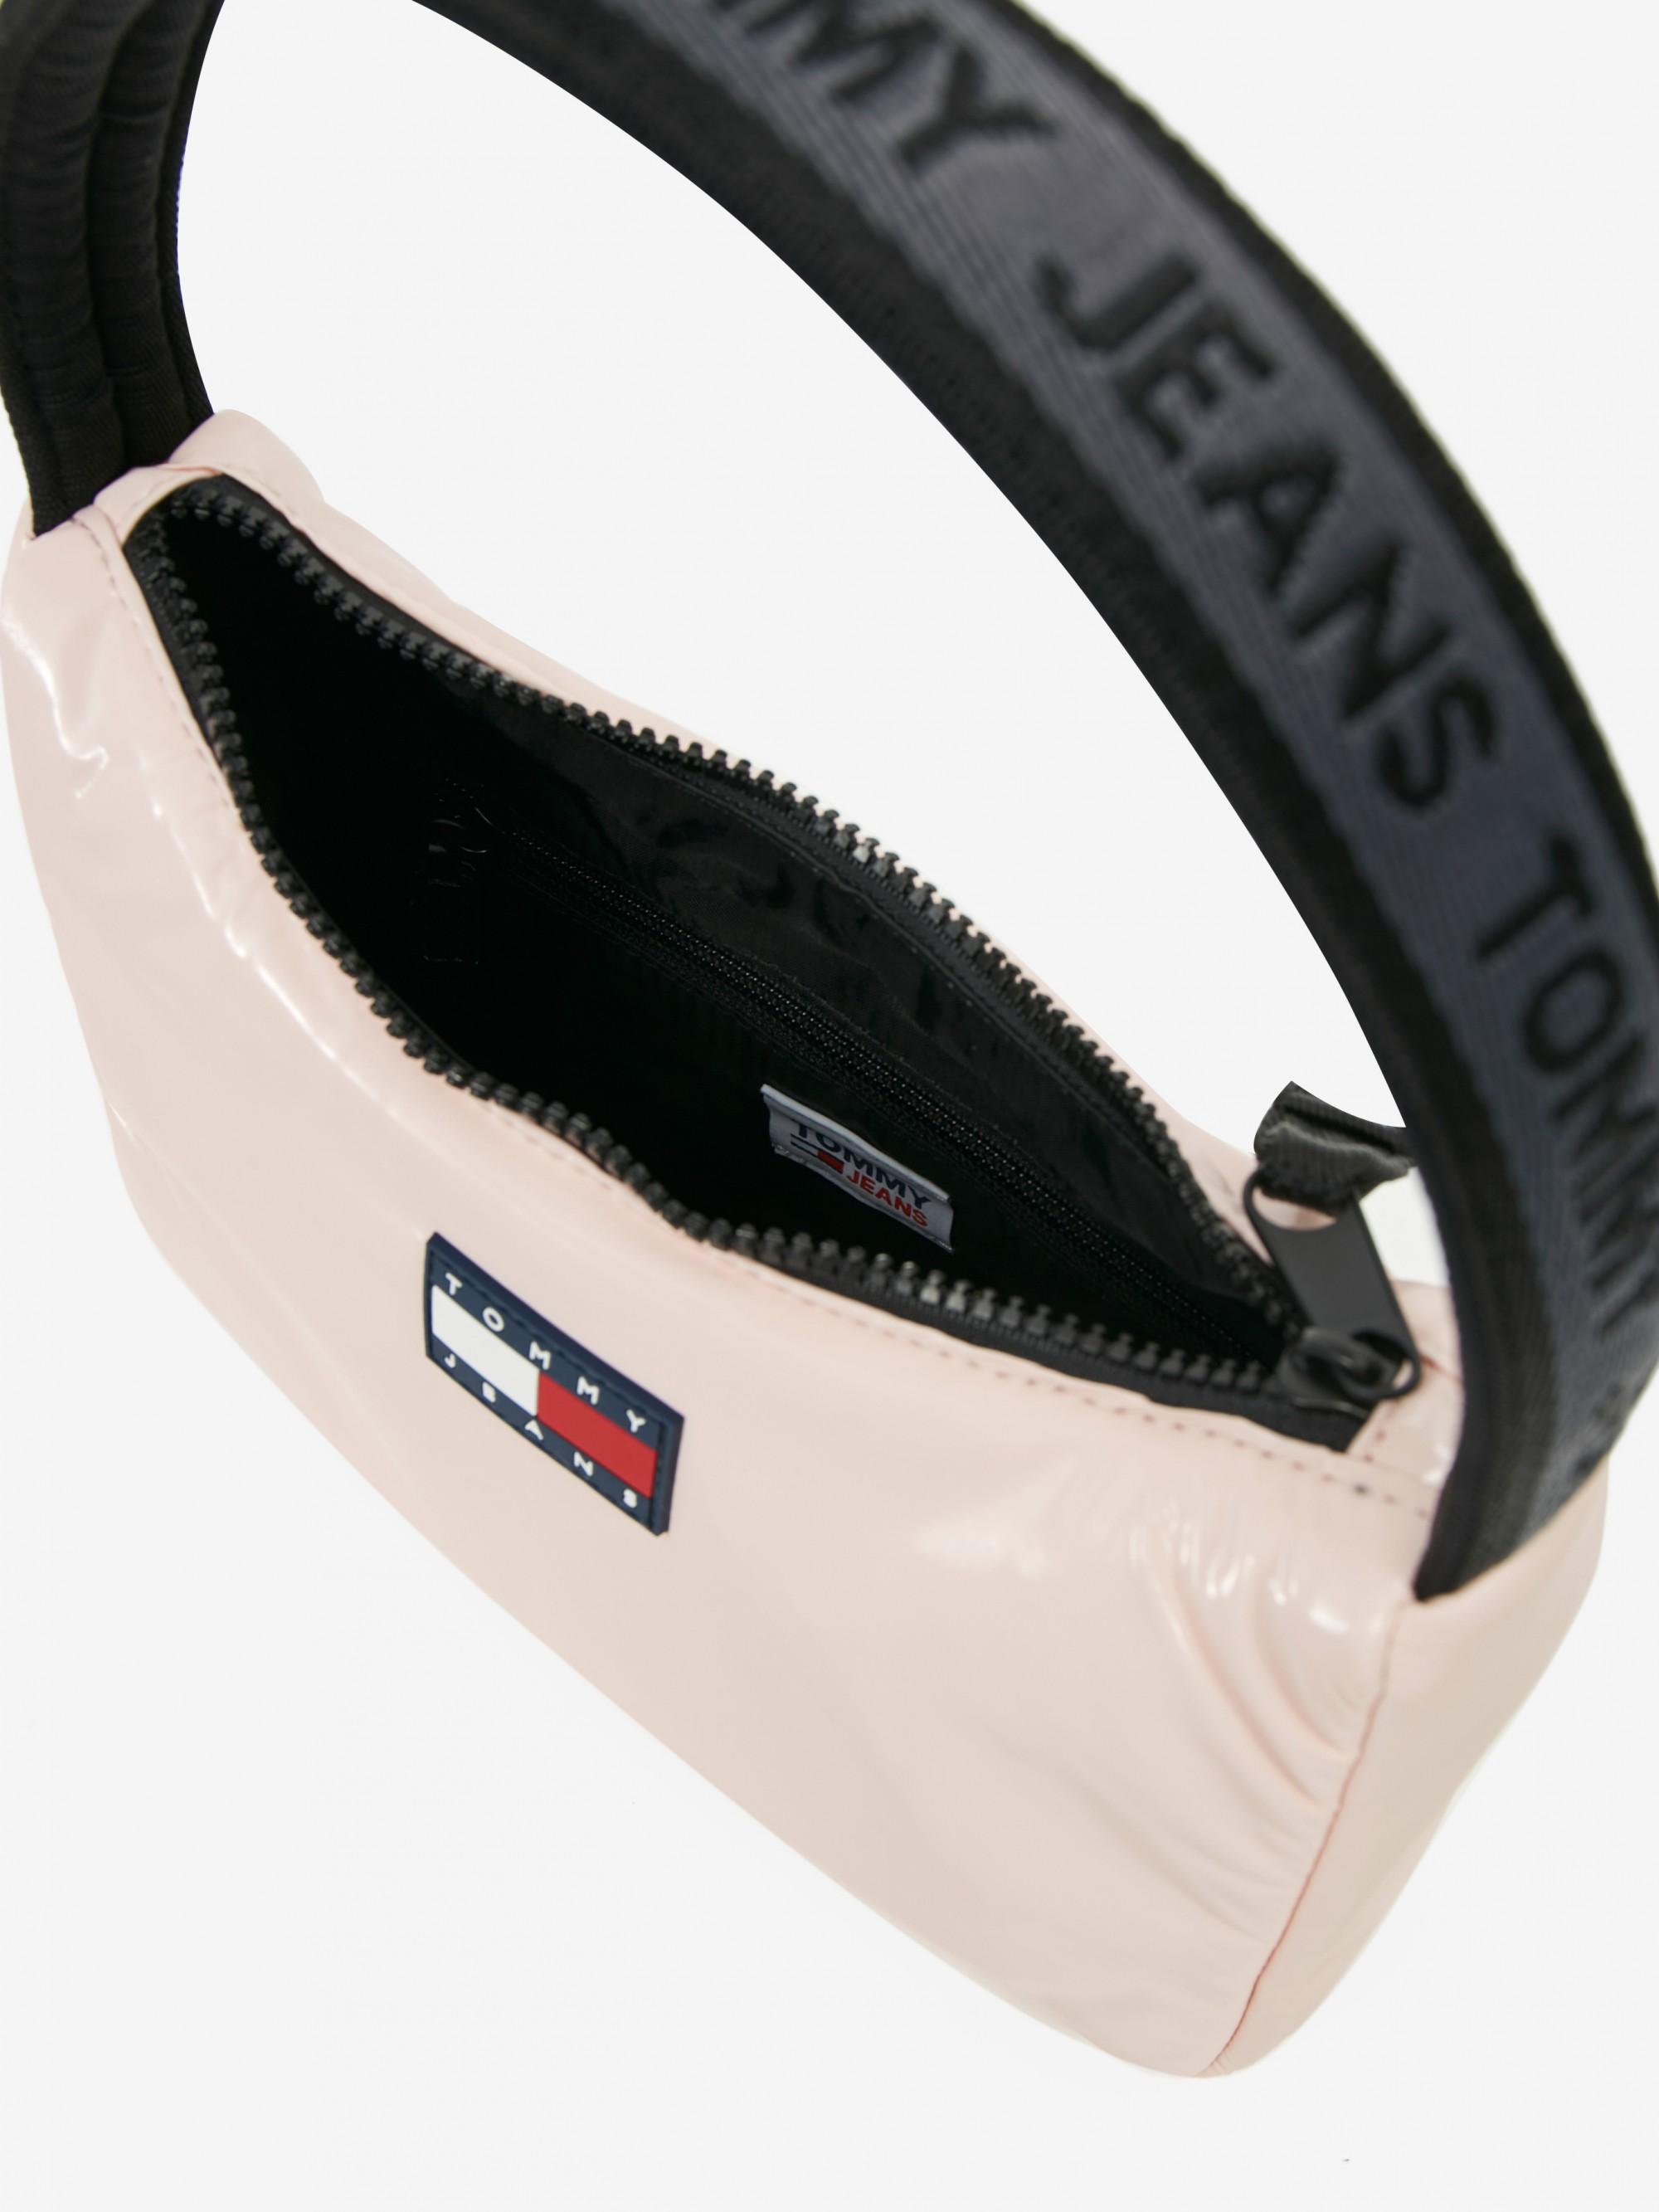 Tommy Hilfiger pink handbag